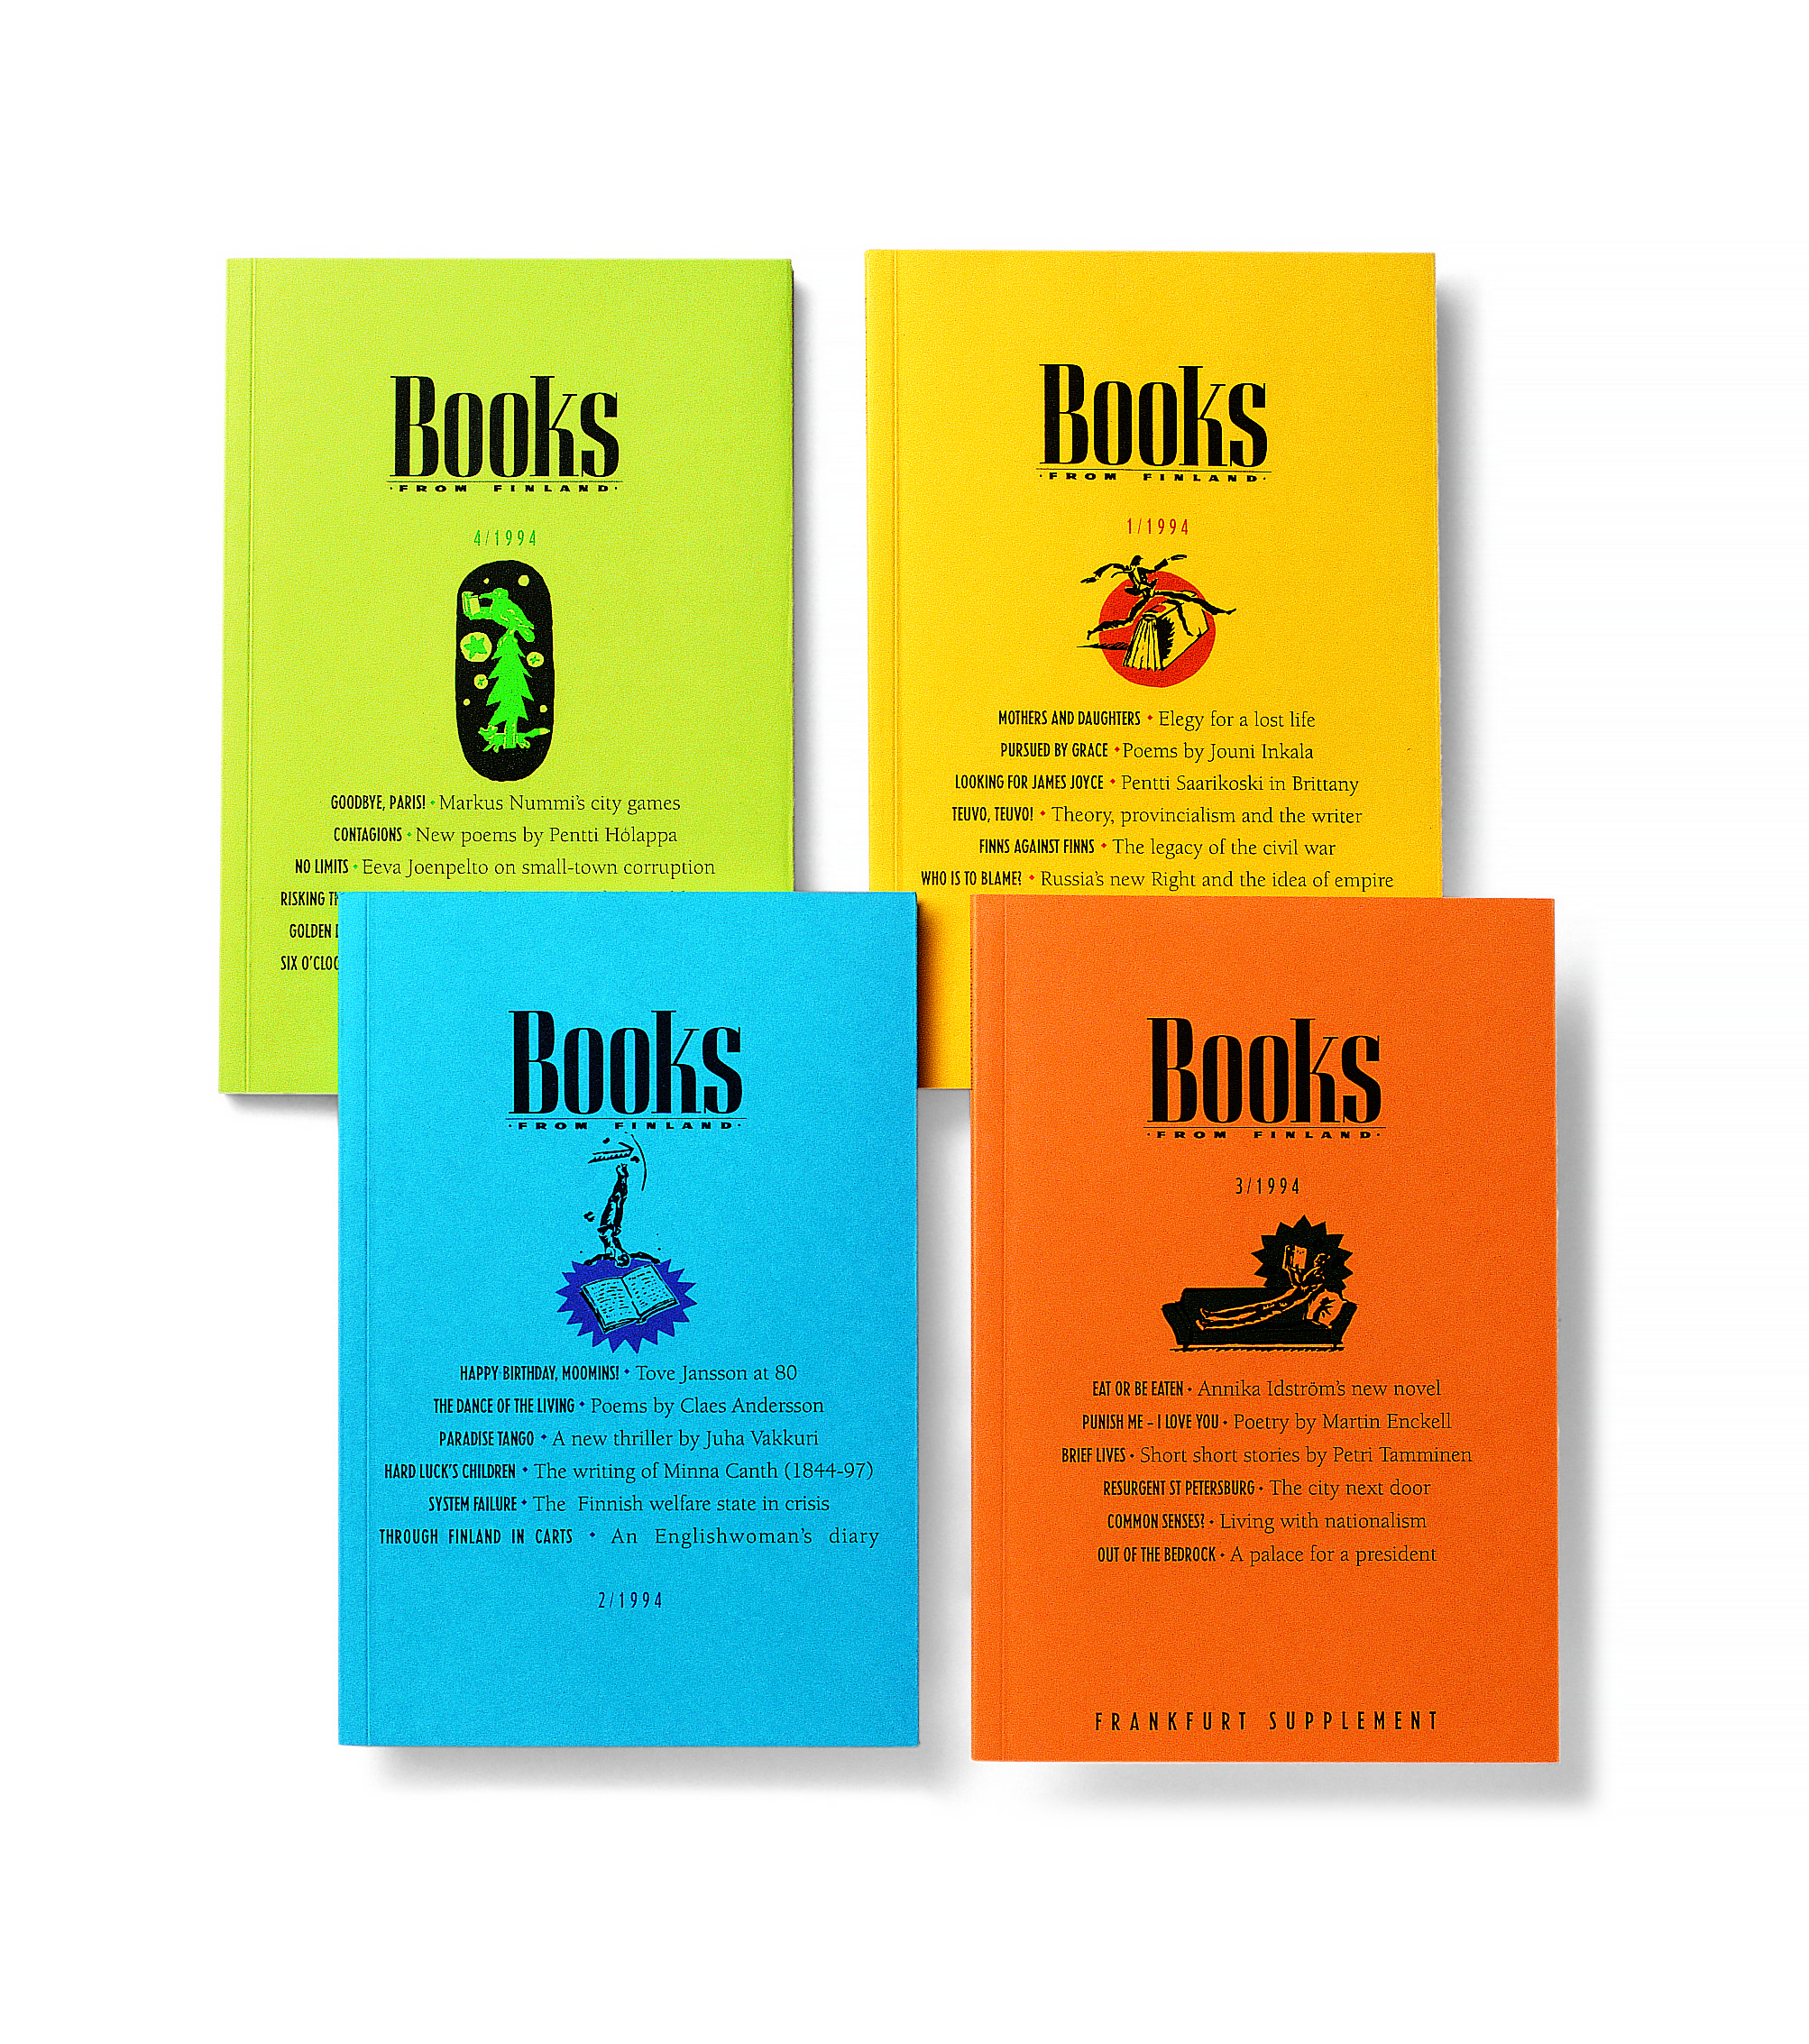 booksfromfinland